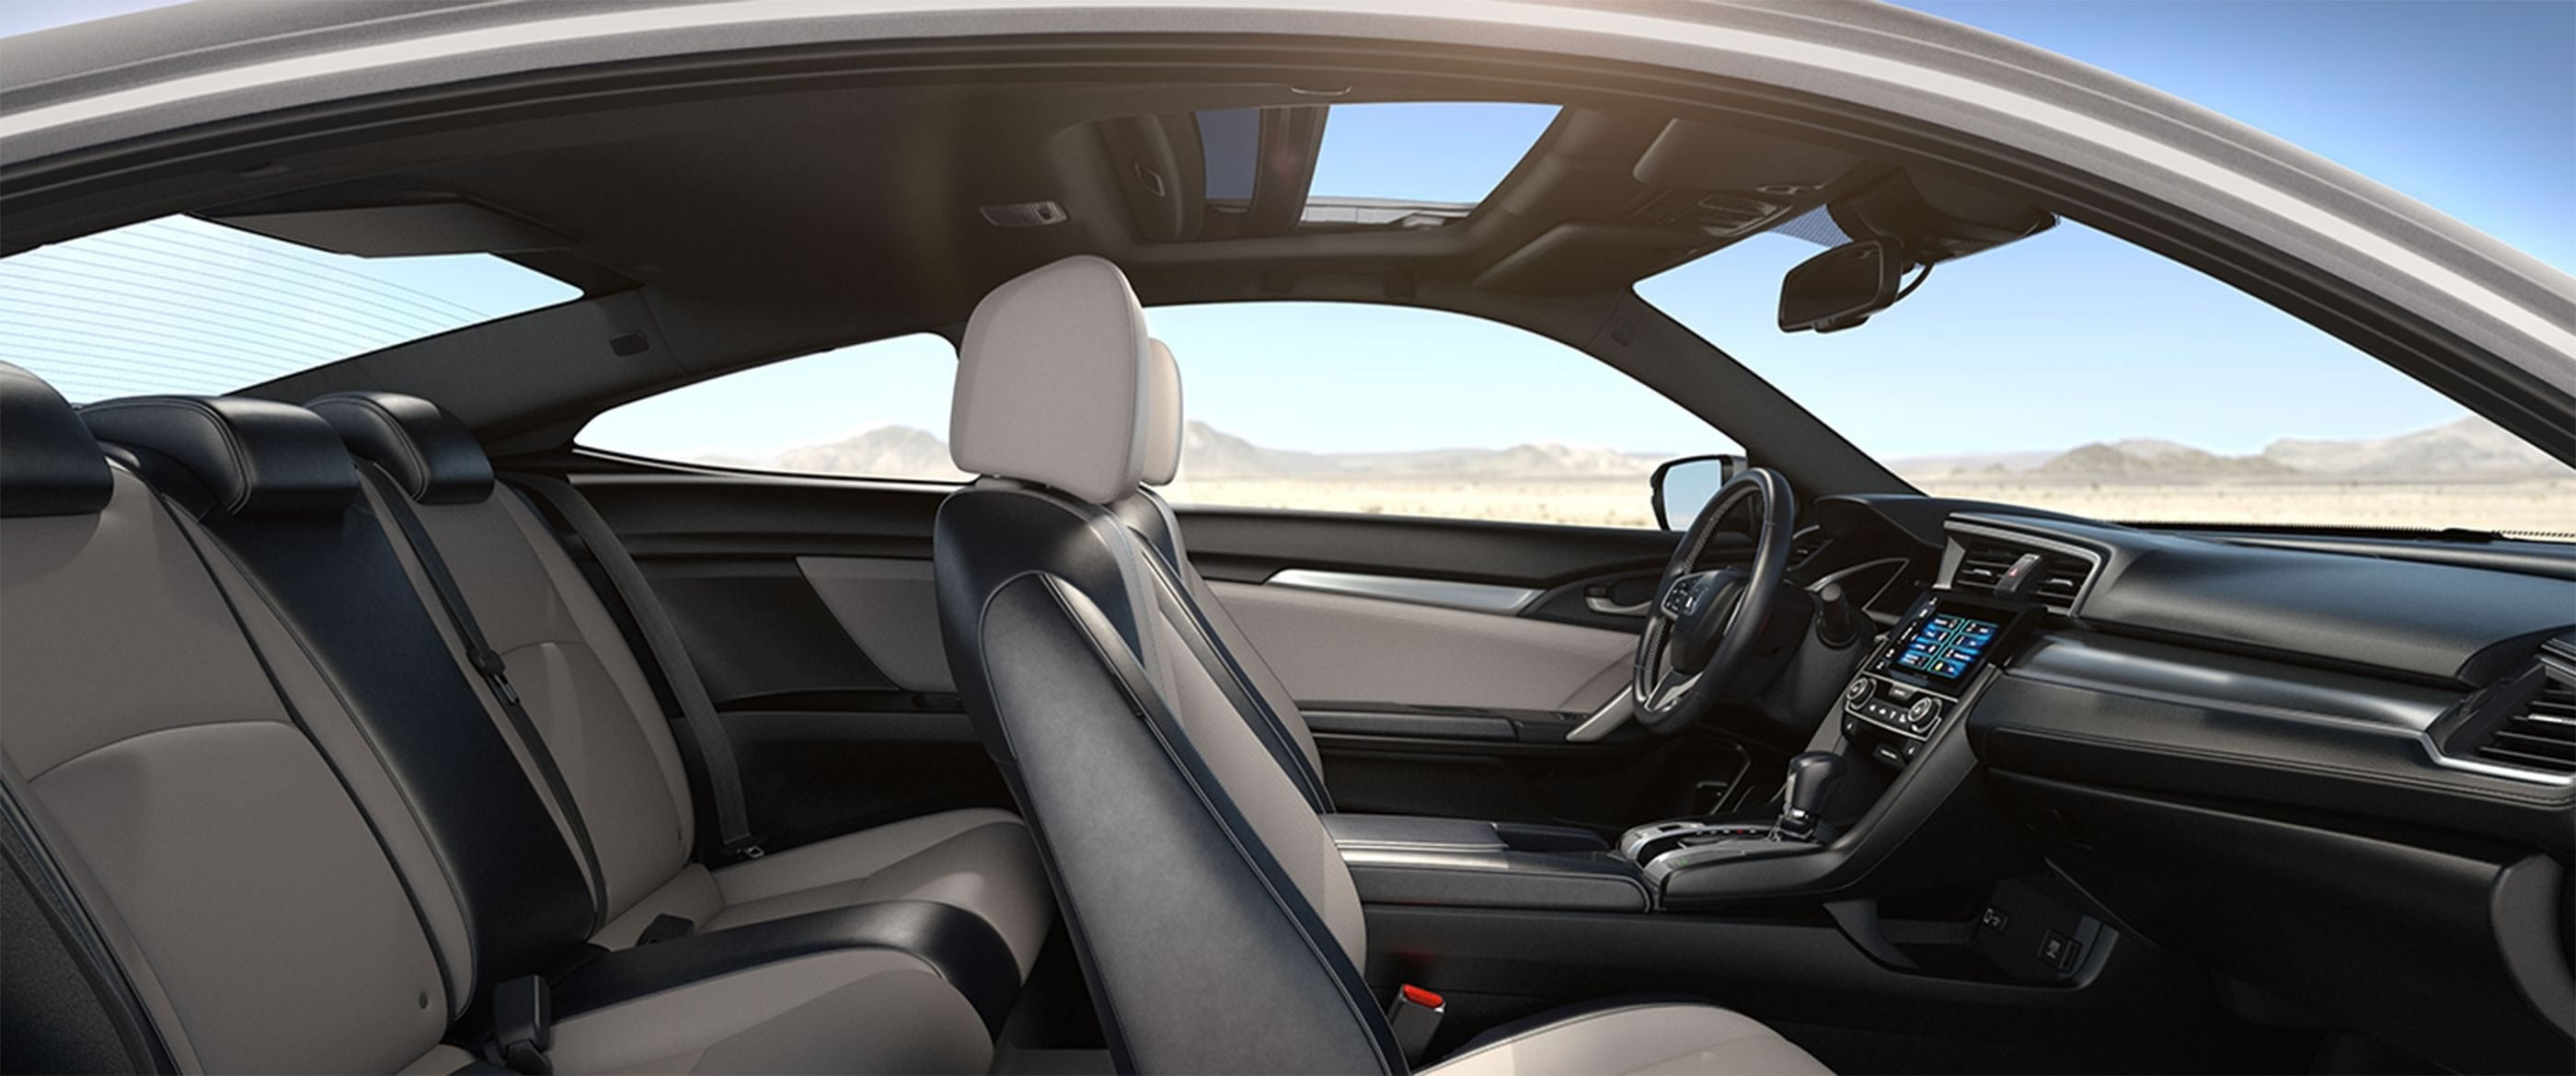 2017 Honda Civic Coupe Seating Interior